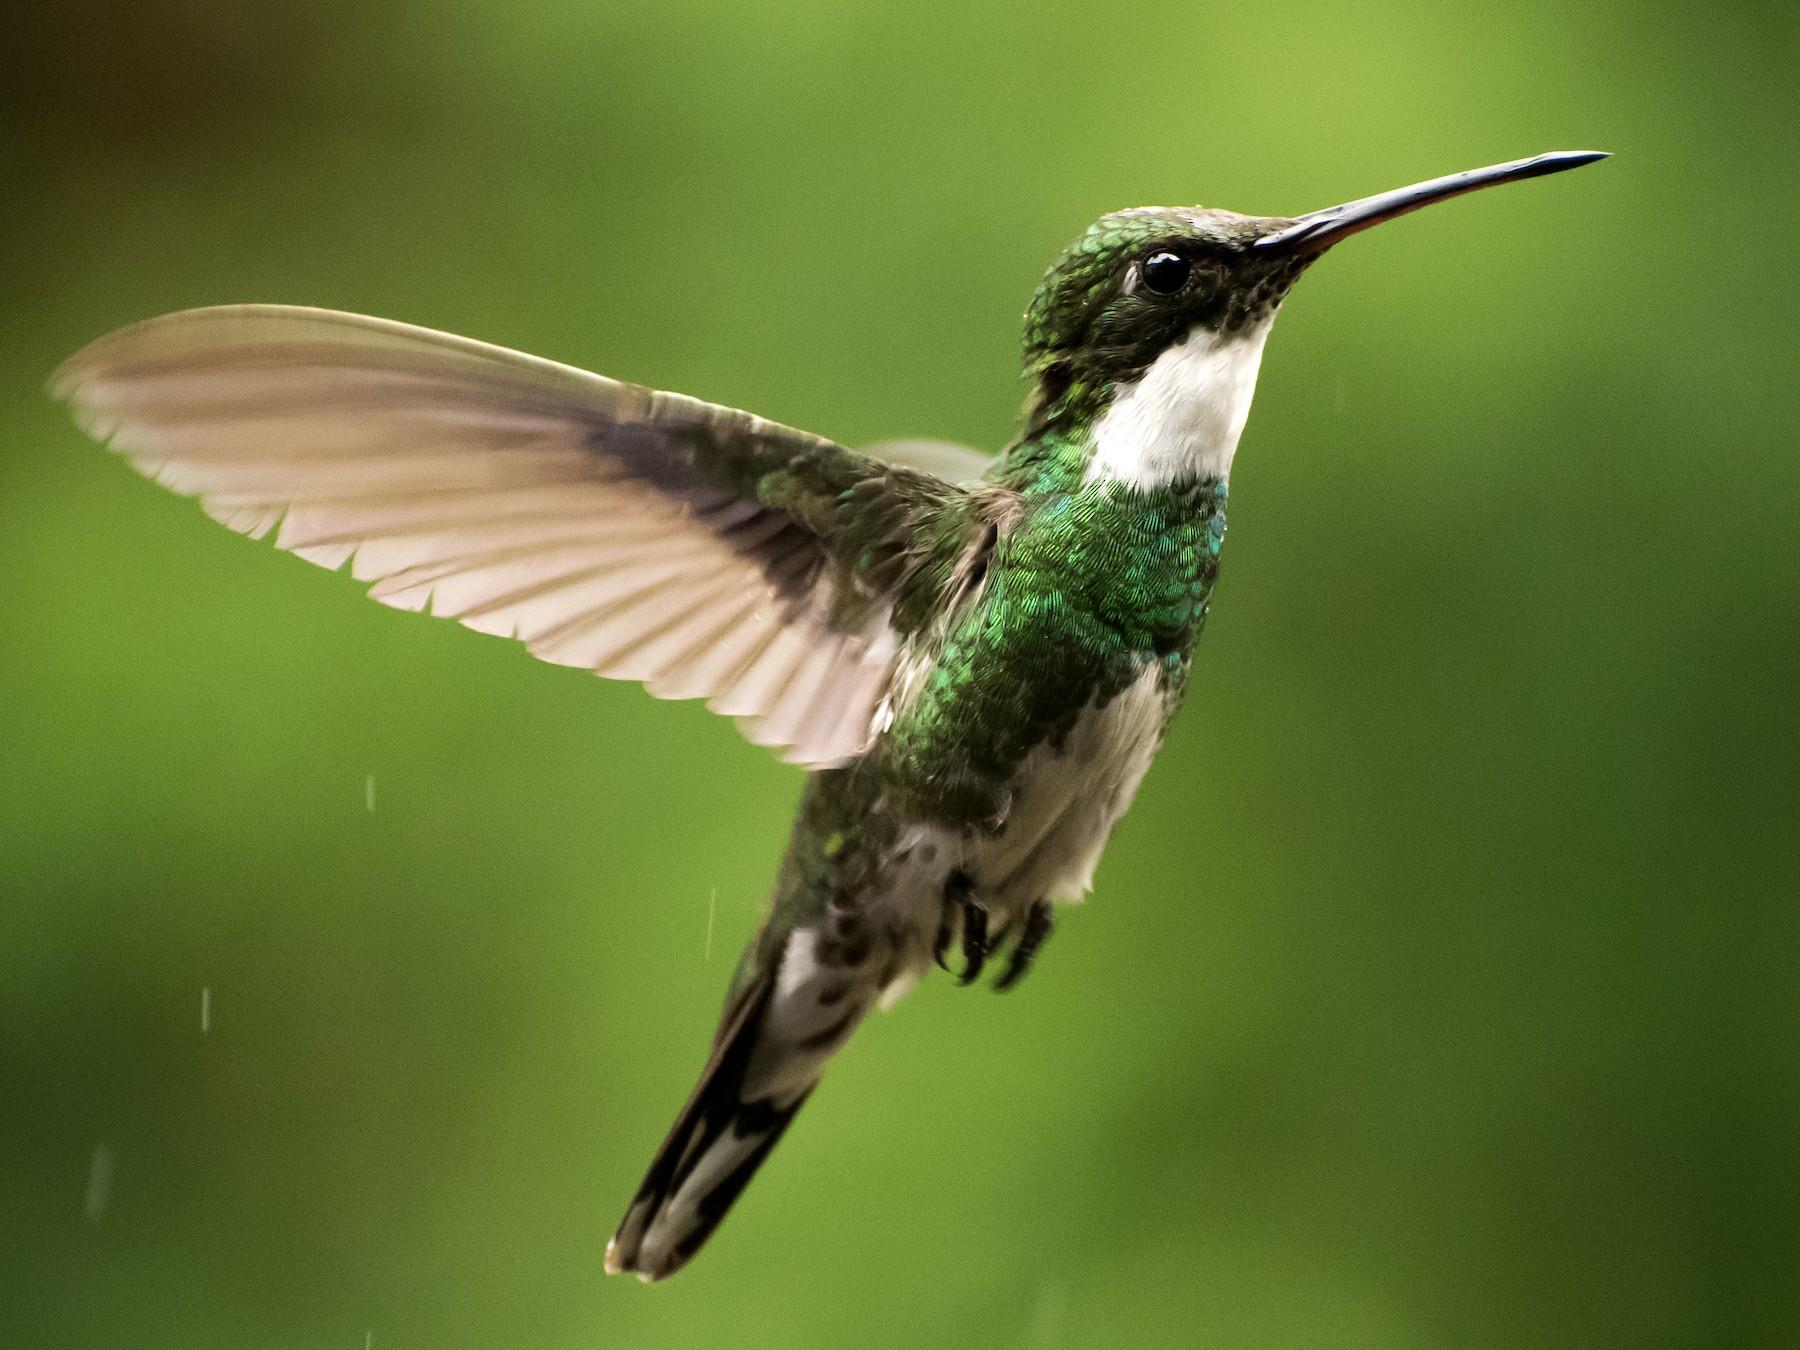 White-throated Hummingbird - Luiz Carlos Ramassotti